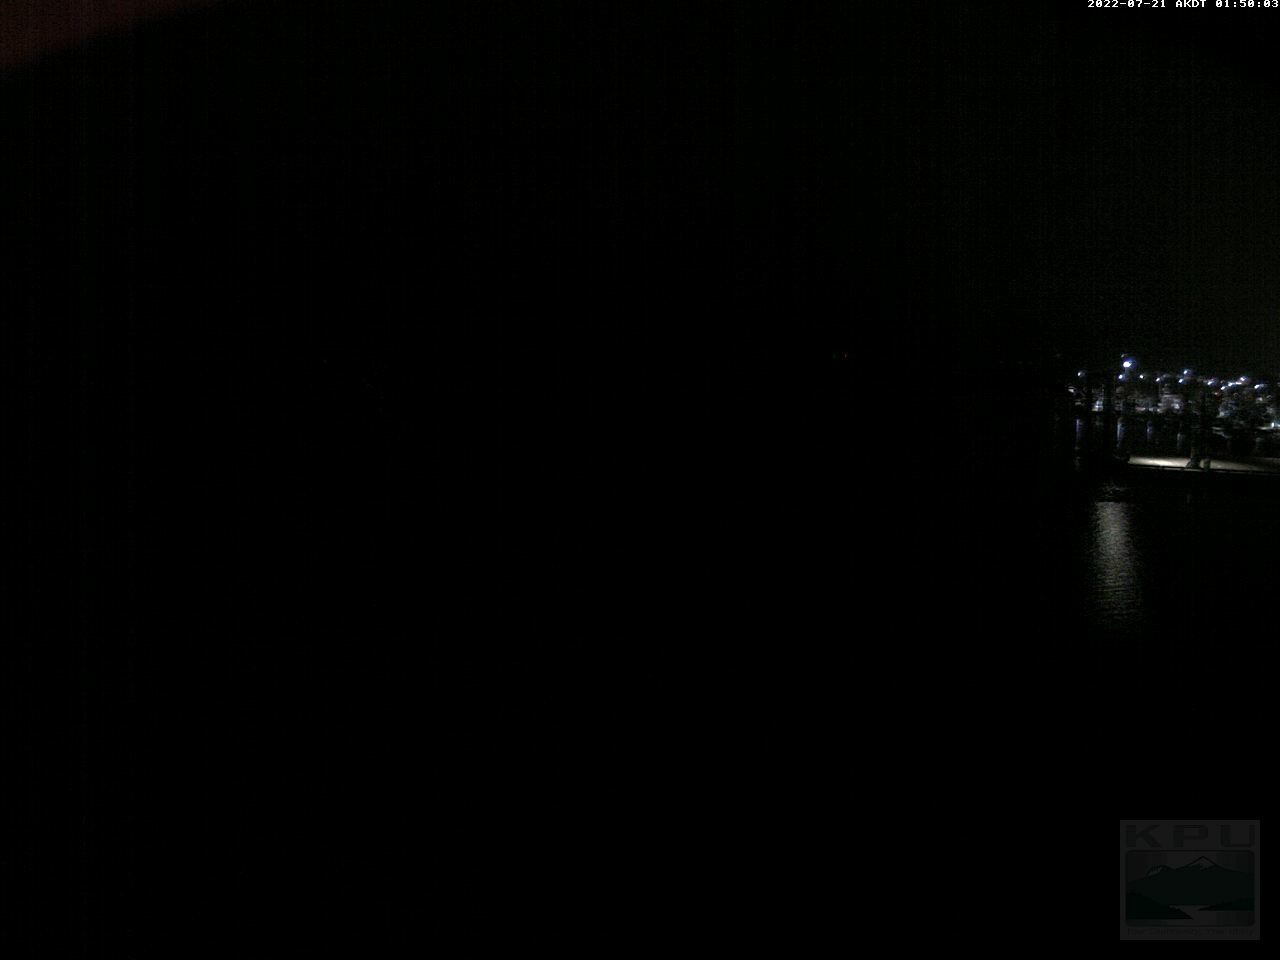 Current Ketchikan Webcam #4 Alaska-sized Image